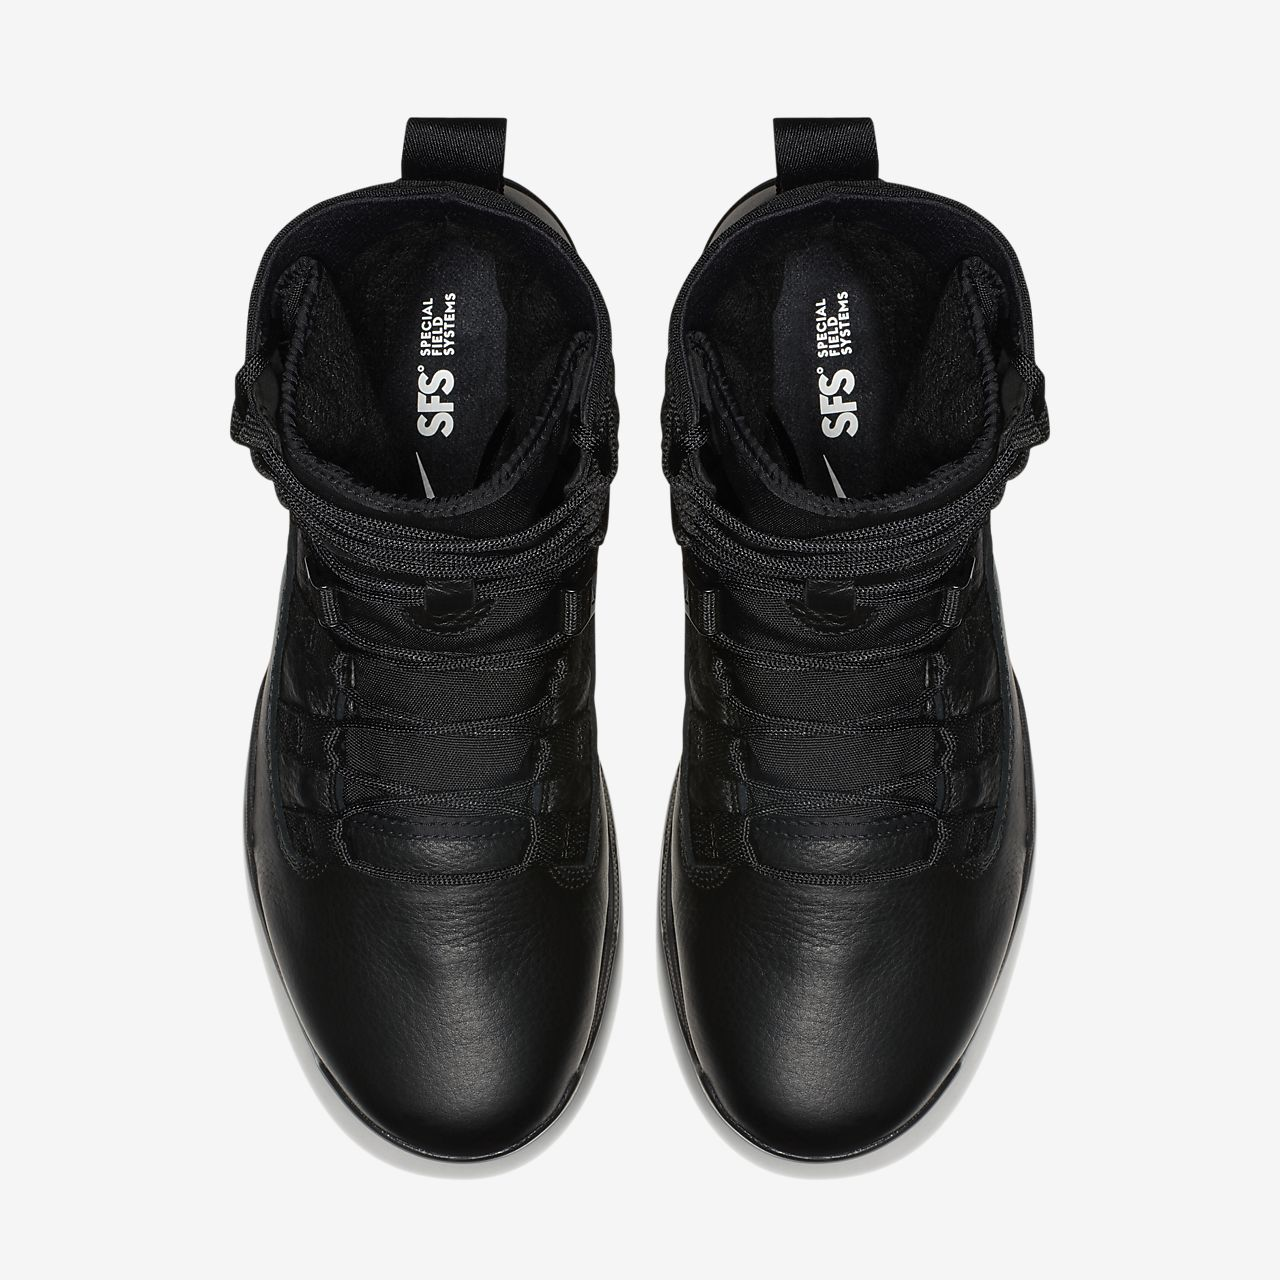 cb479a574d0 Nike SFB Gen 2 8